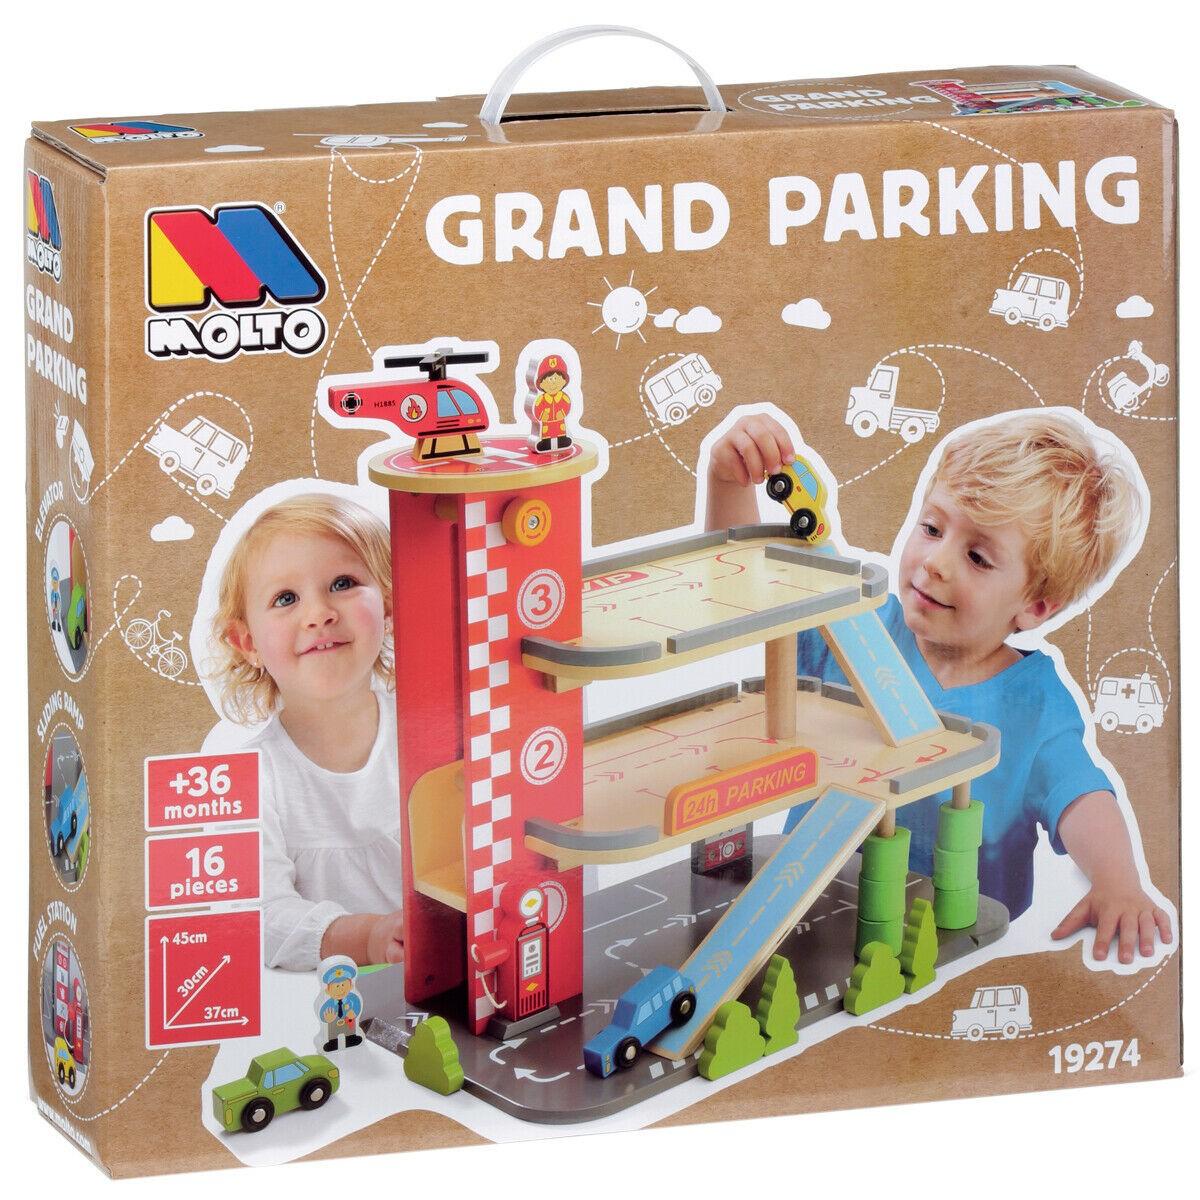 Molto Parking de madera Grand Parking